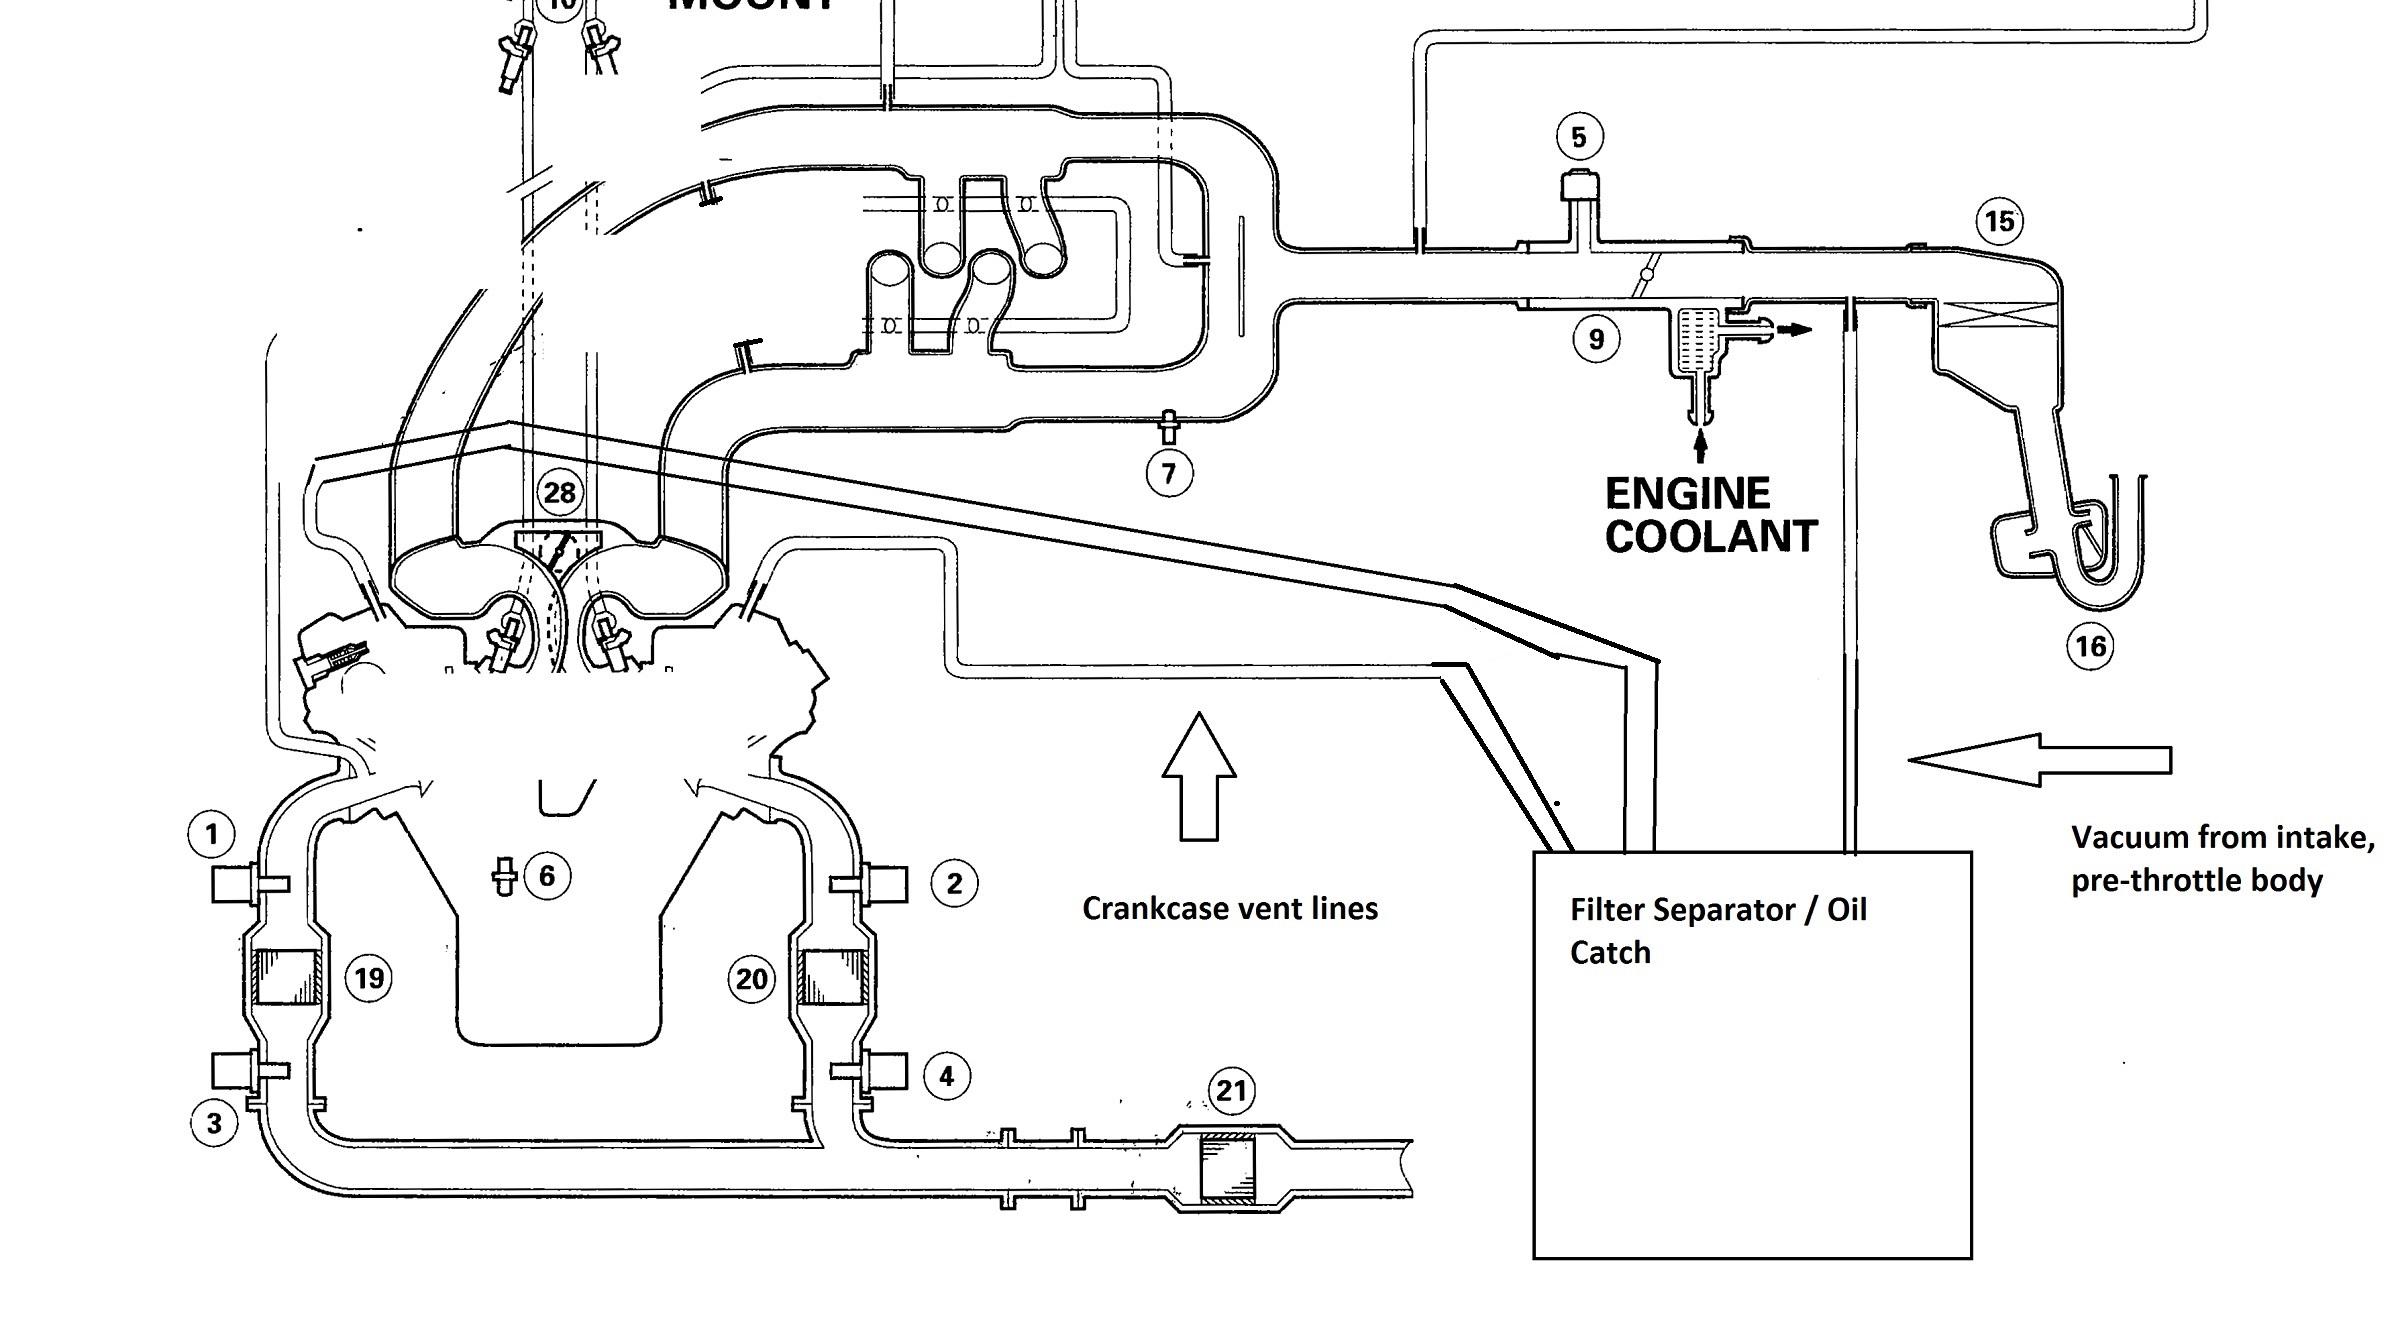 Acura Tl Transmission Diagram